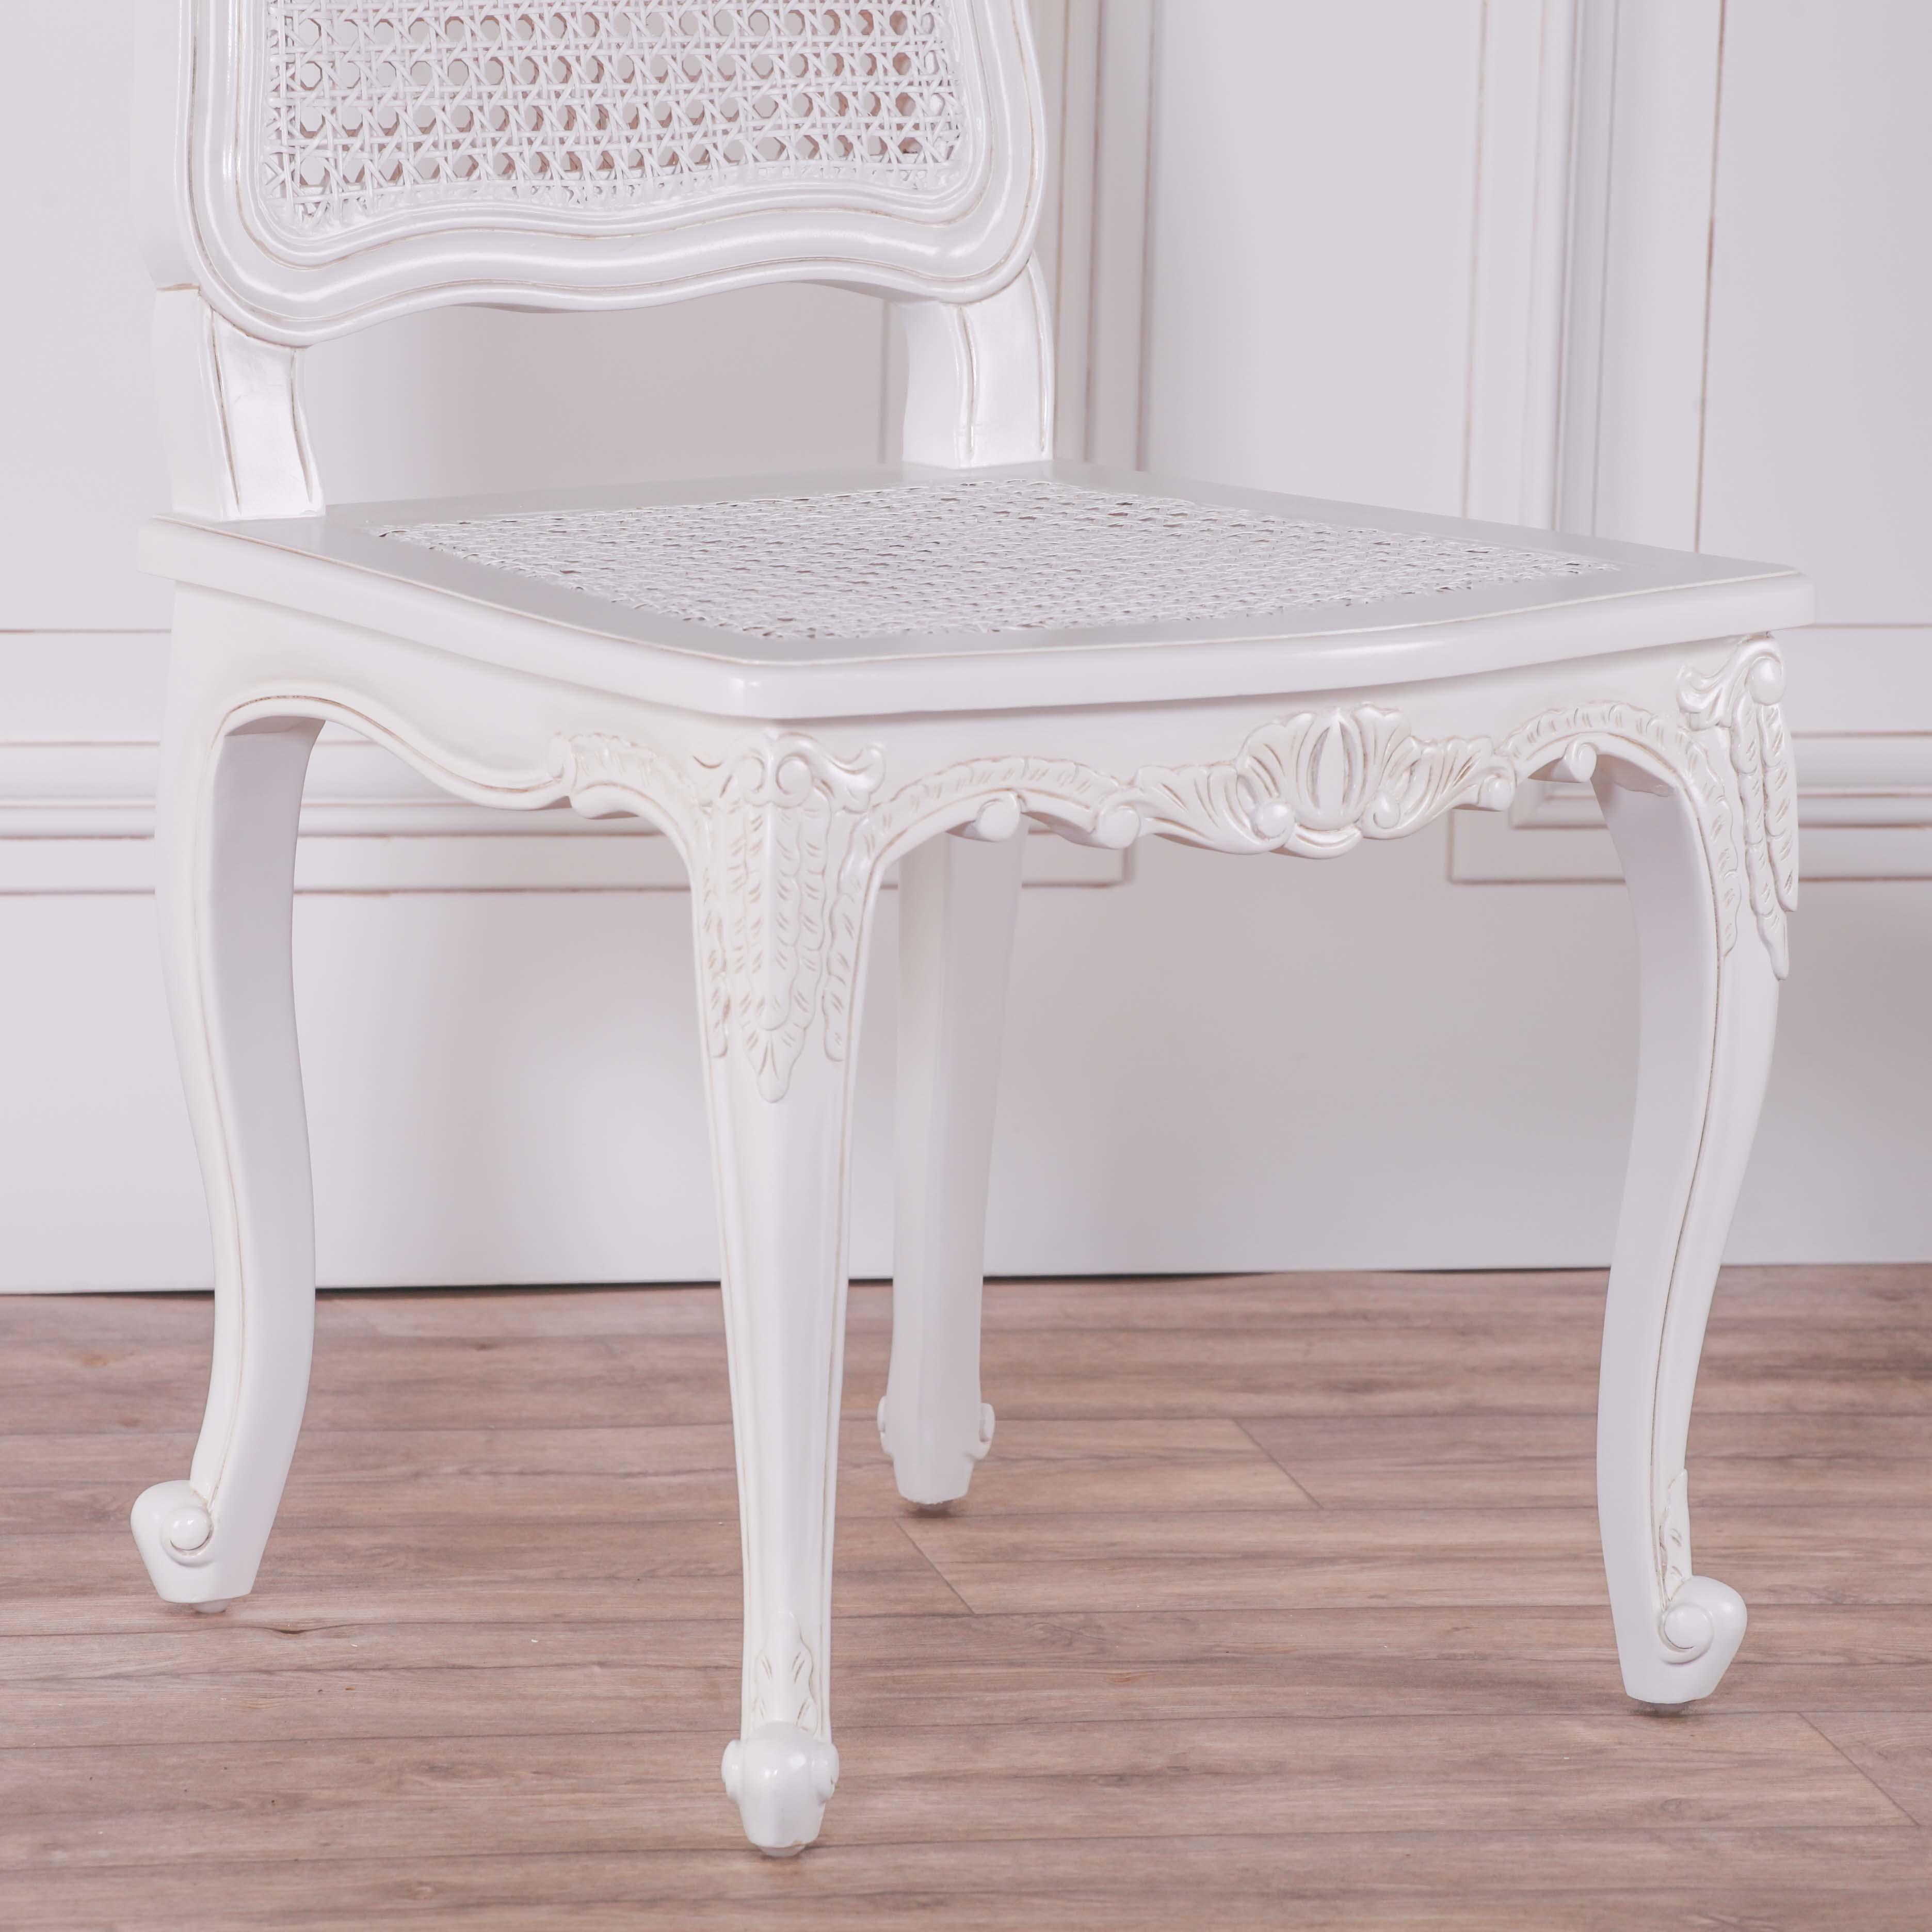 French Provencal White Rattan Chair Furniture La Maison